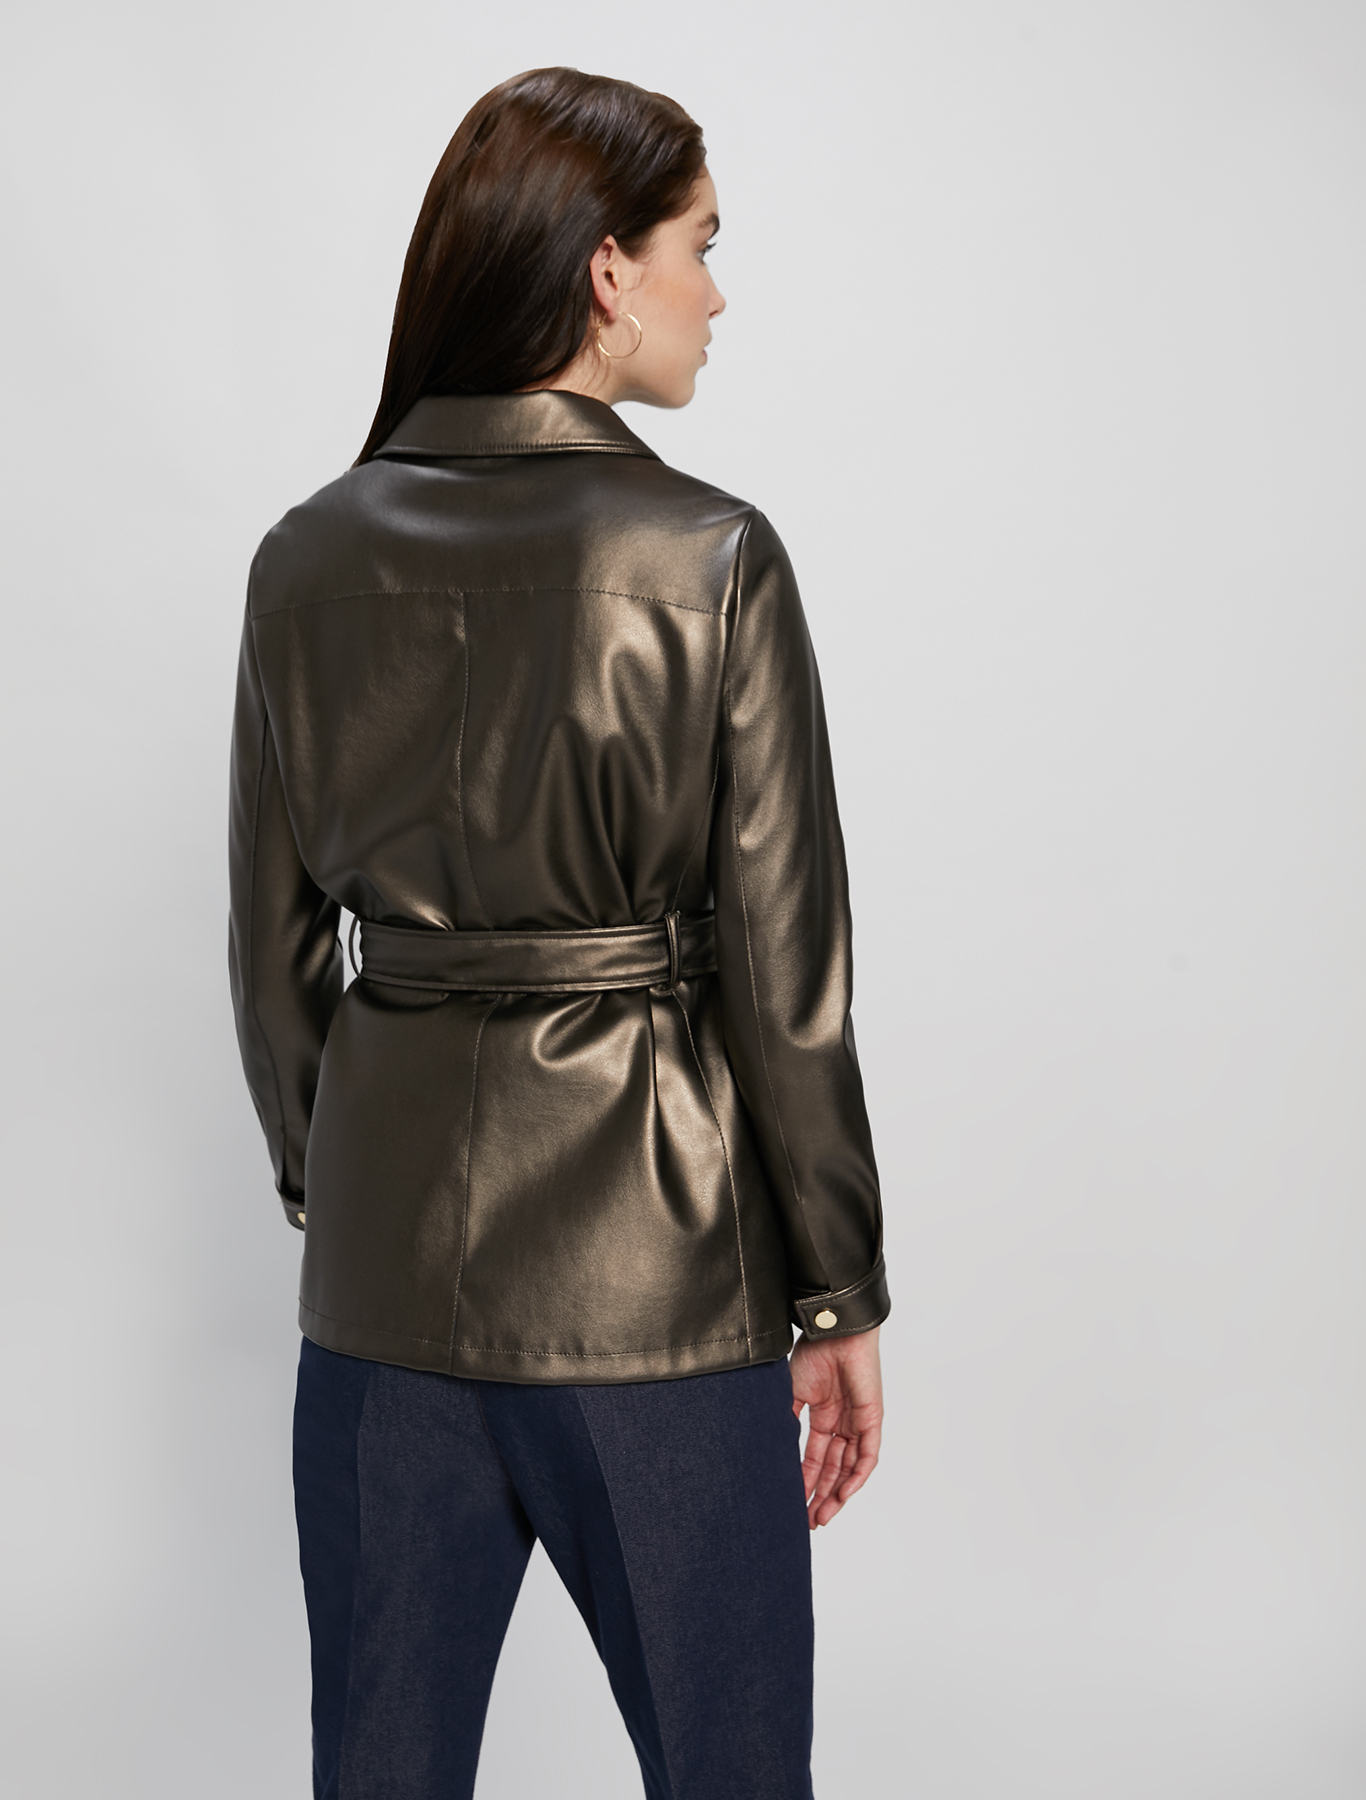 Laminated jersey safari jacket - bronze - pennyblack